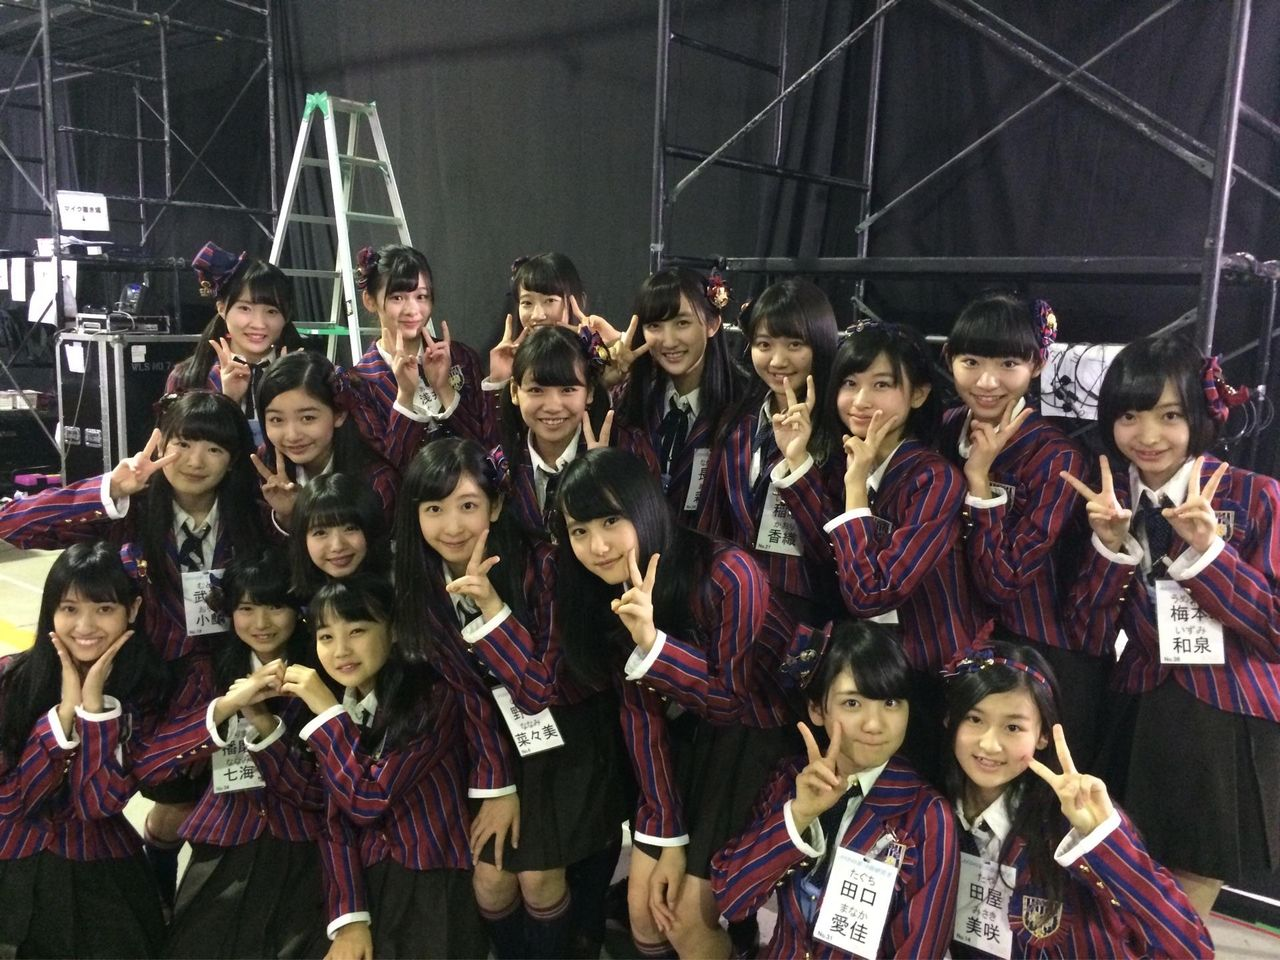 【AKB48】16期生の集合写真にあの大先輩が・・・・